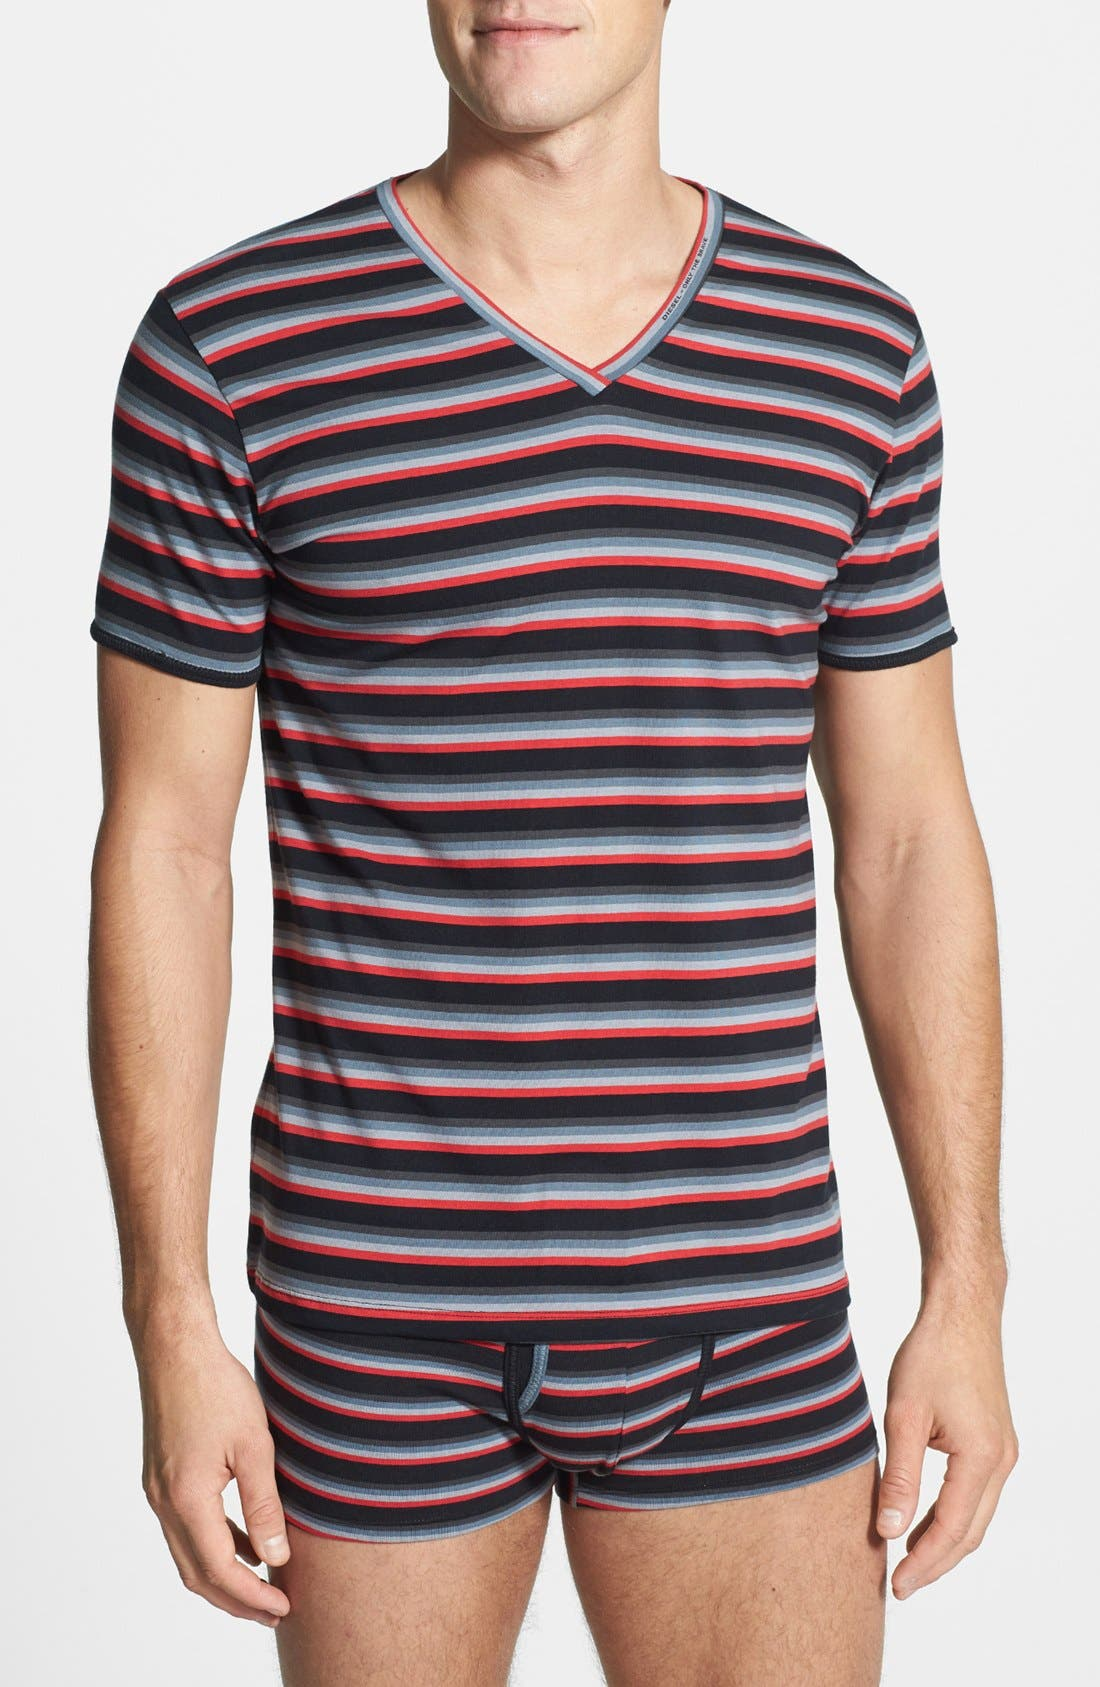 Alternate Image 1 Selected - DIESEL® 'Michael' Striped V-Neck Undershirt